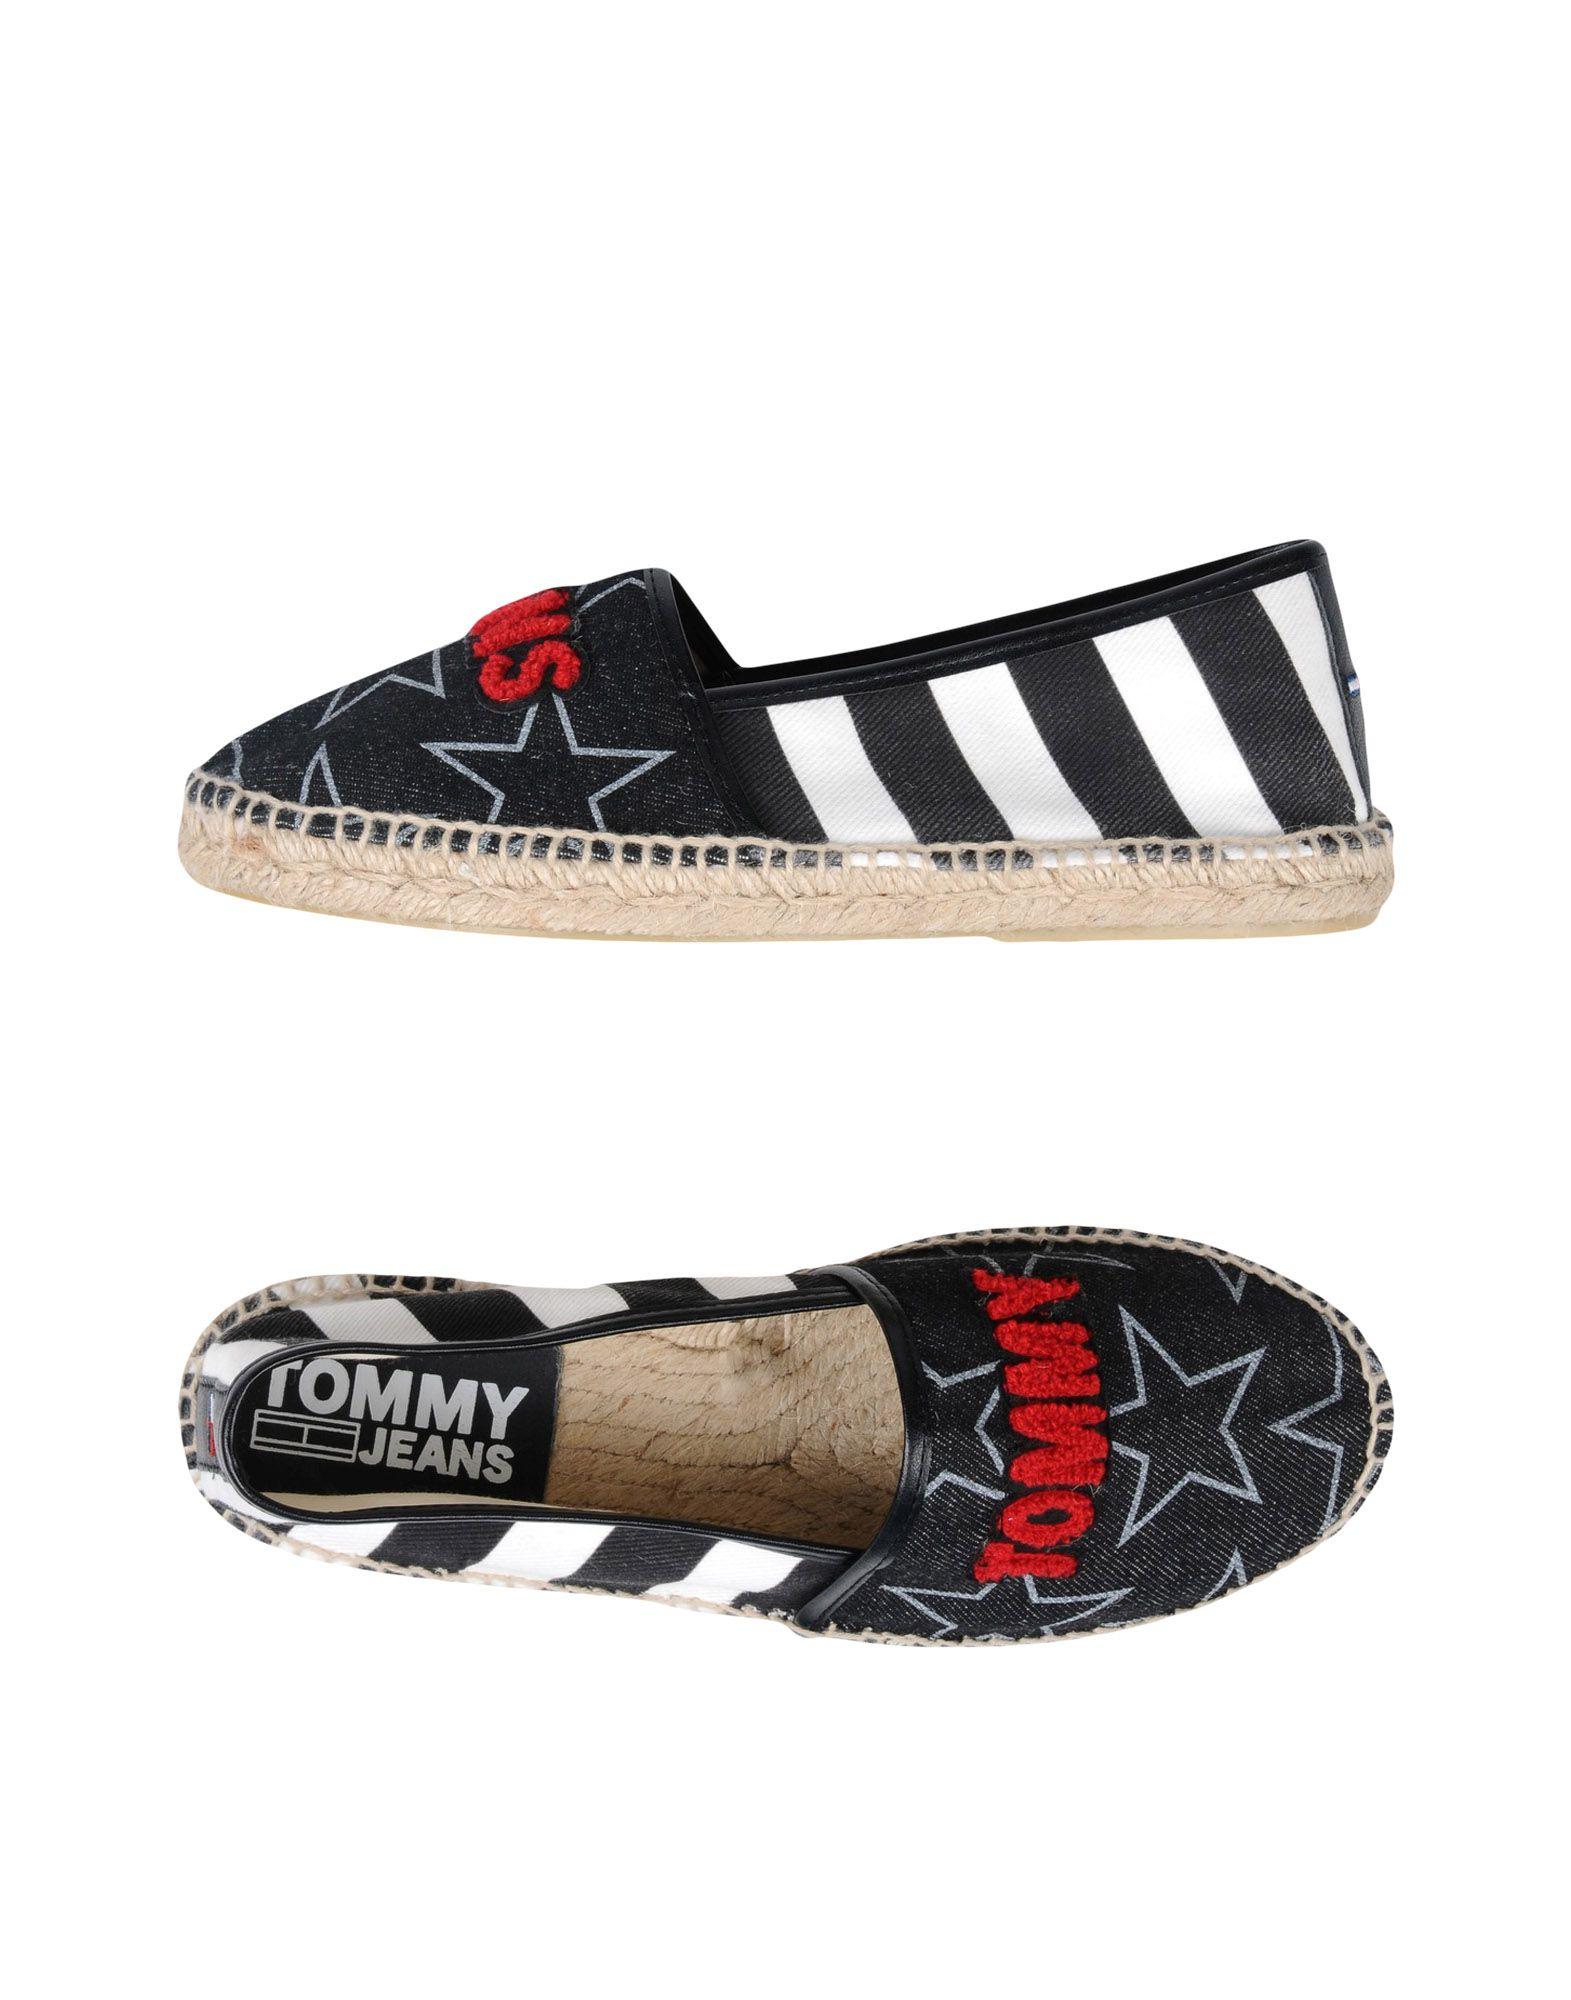 Espadrilles Tommy Jeans Flat Tj Espadrille - Femme - Espadrilles Tommy Jeans sur